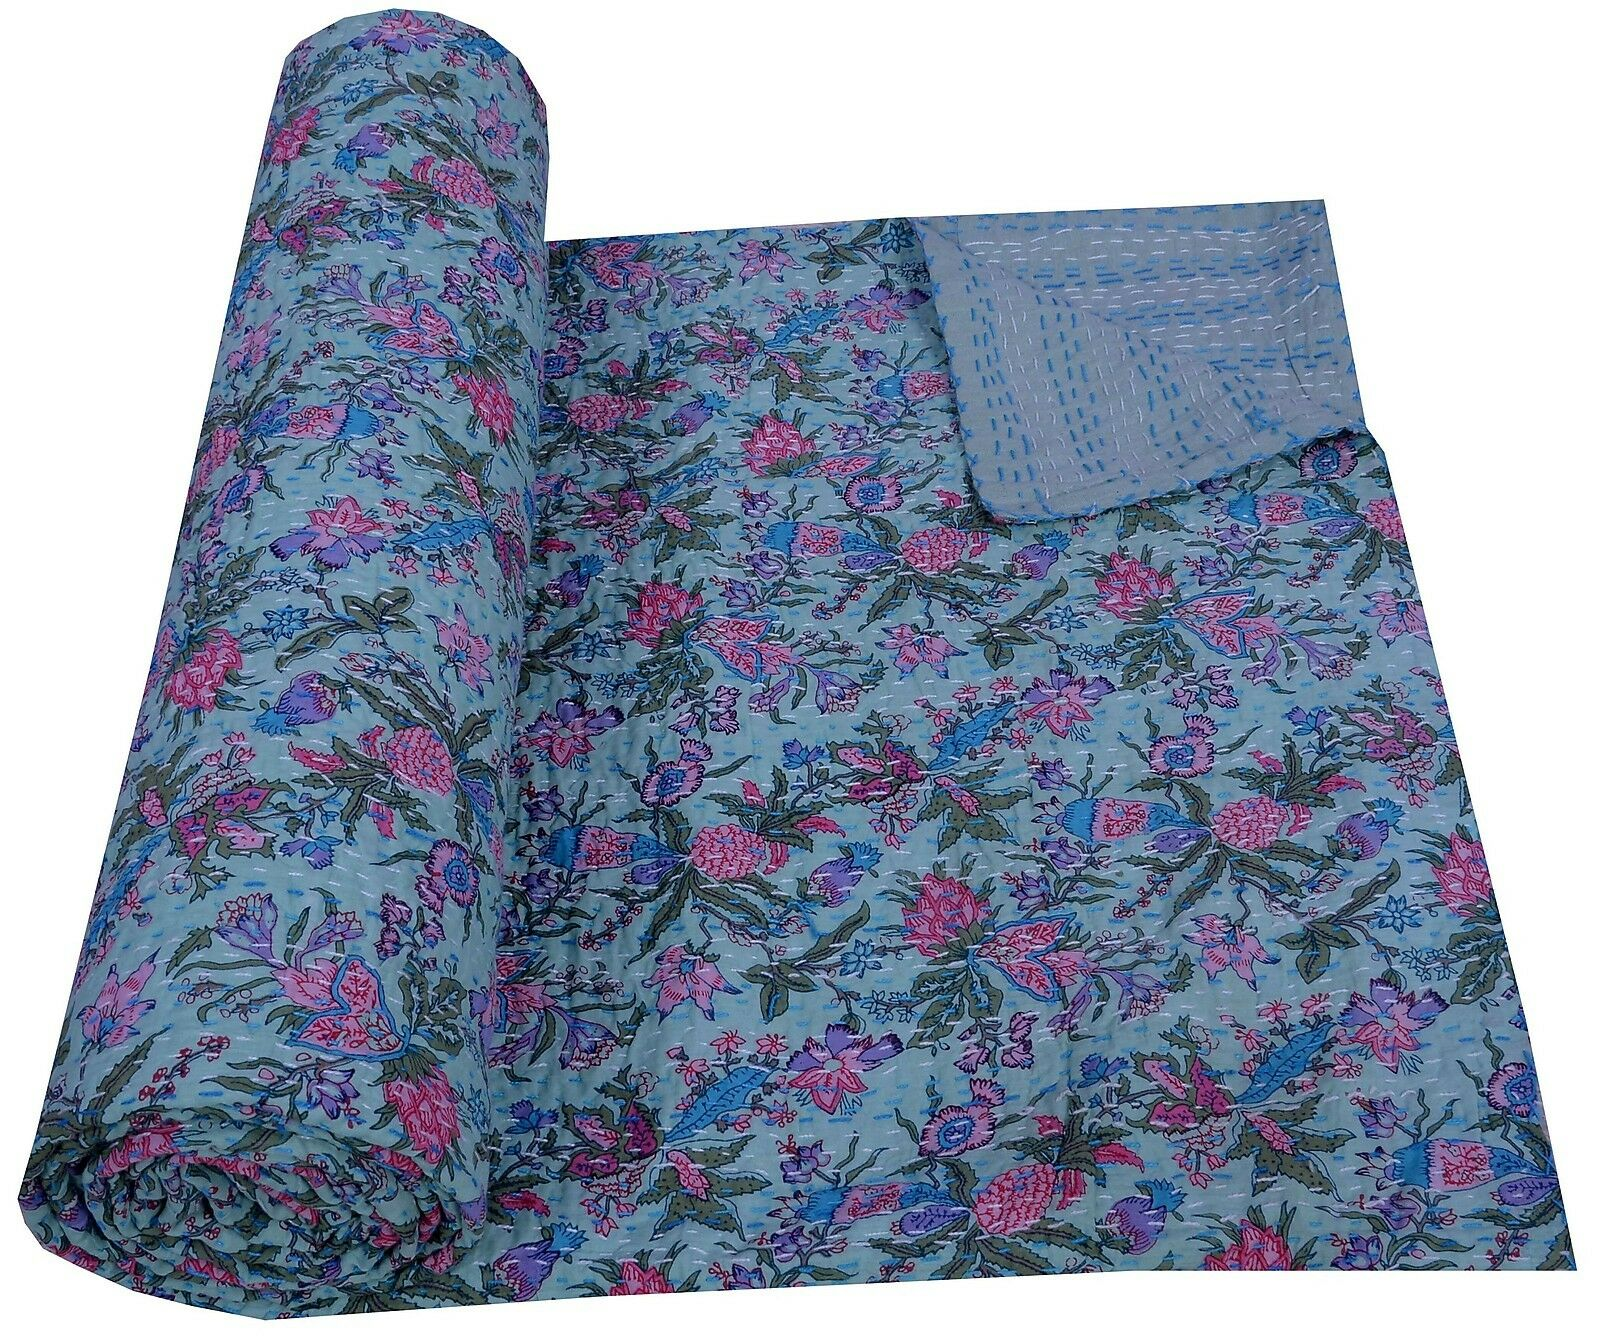 Queen Size Cotton Floral Paradise Green Bedspread Kantha Quilt Gudri Blanket